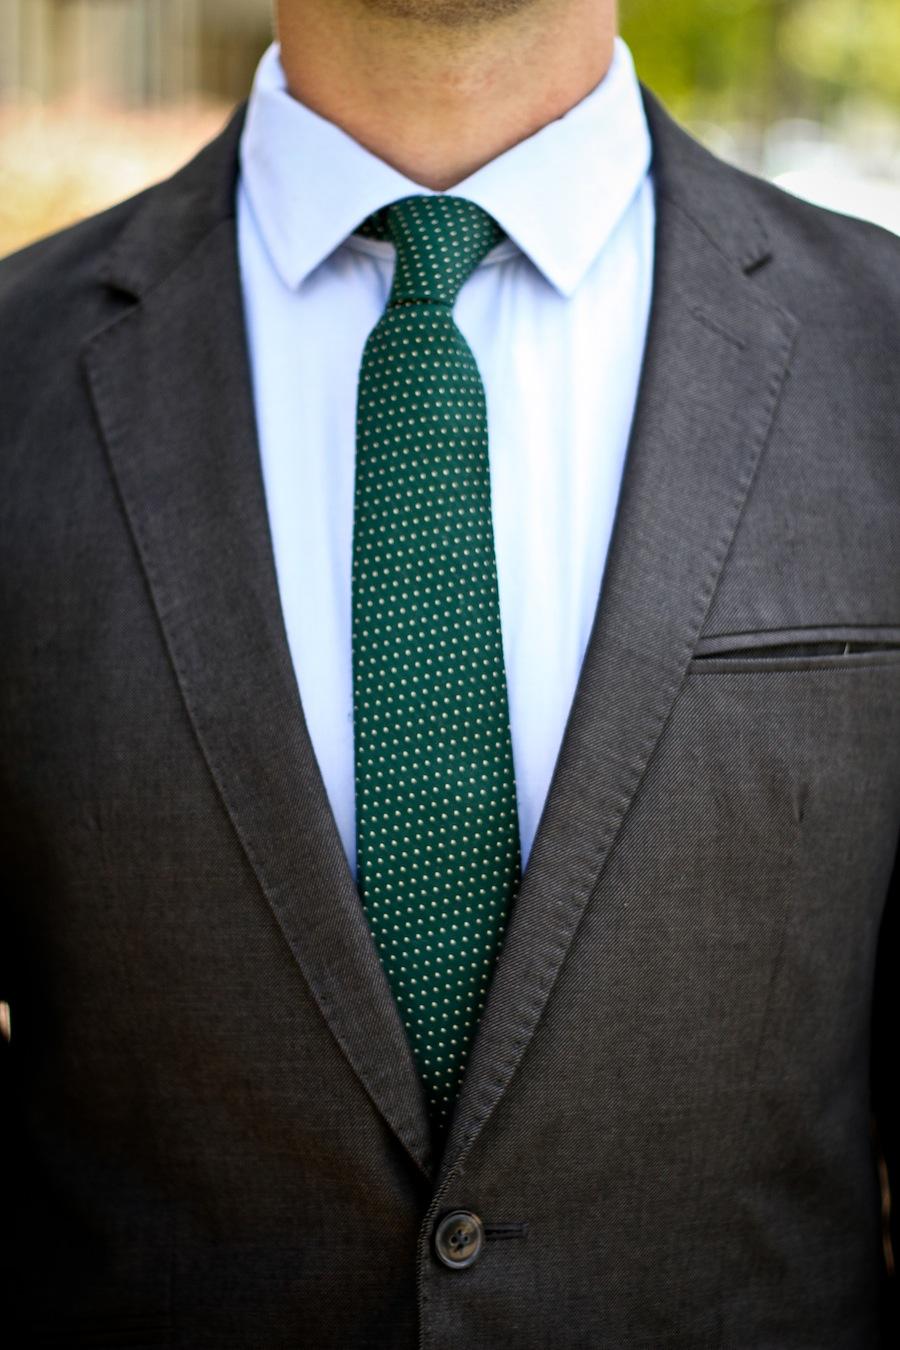 Ryan Wearing Tailored Skinny Tie